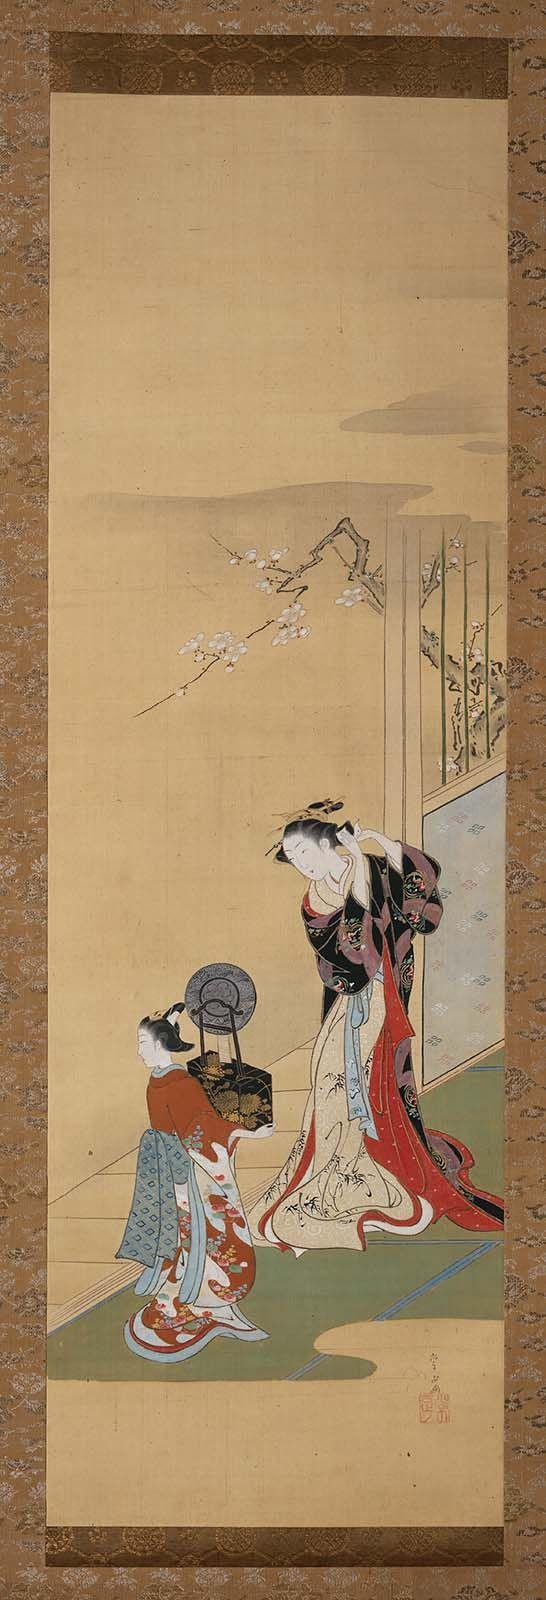 166 best Art japan images on Pinterest | Geishas, Japanese art and ...